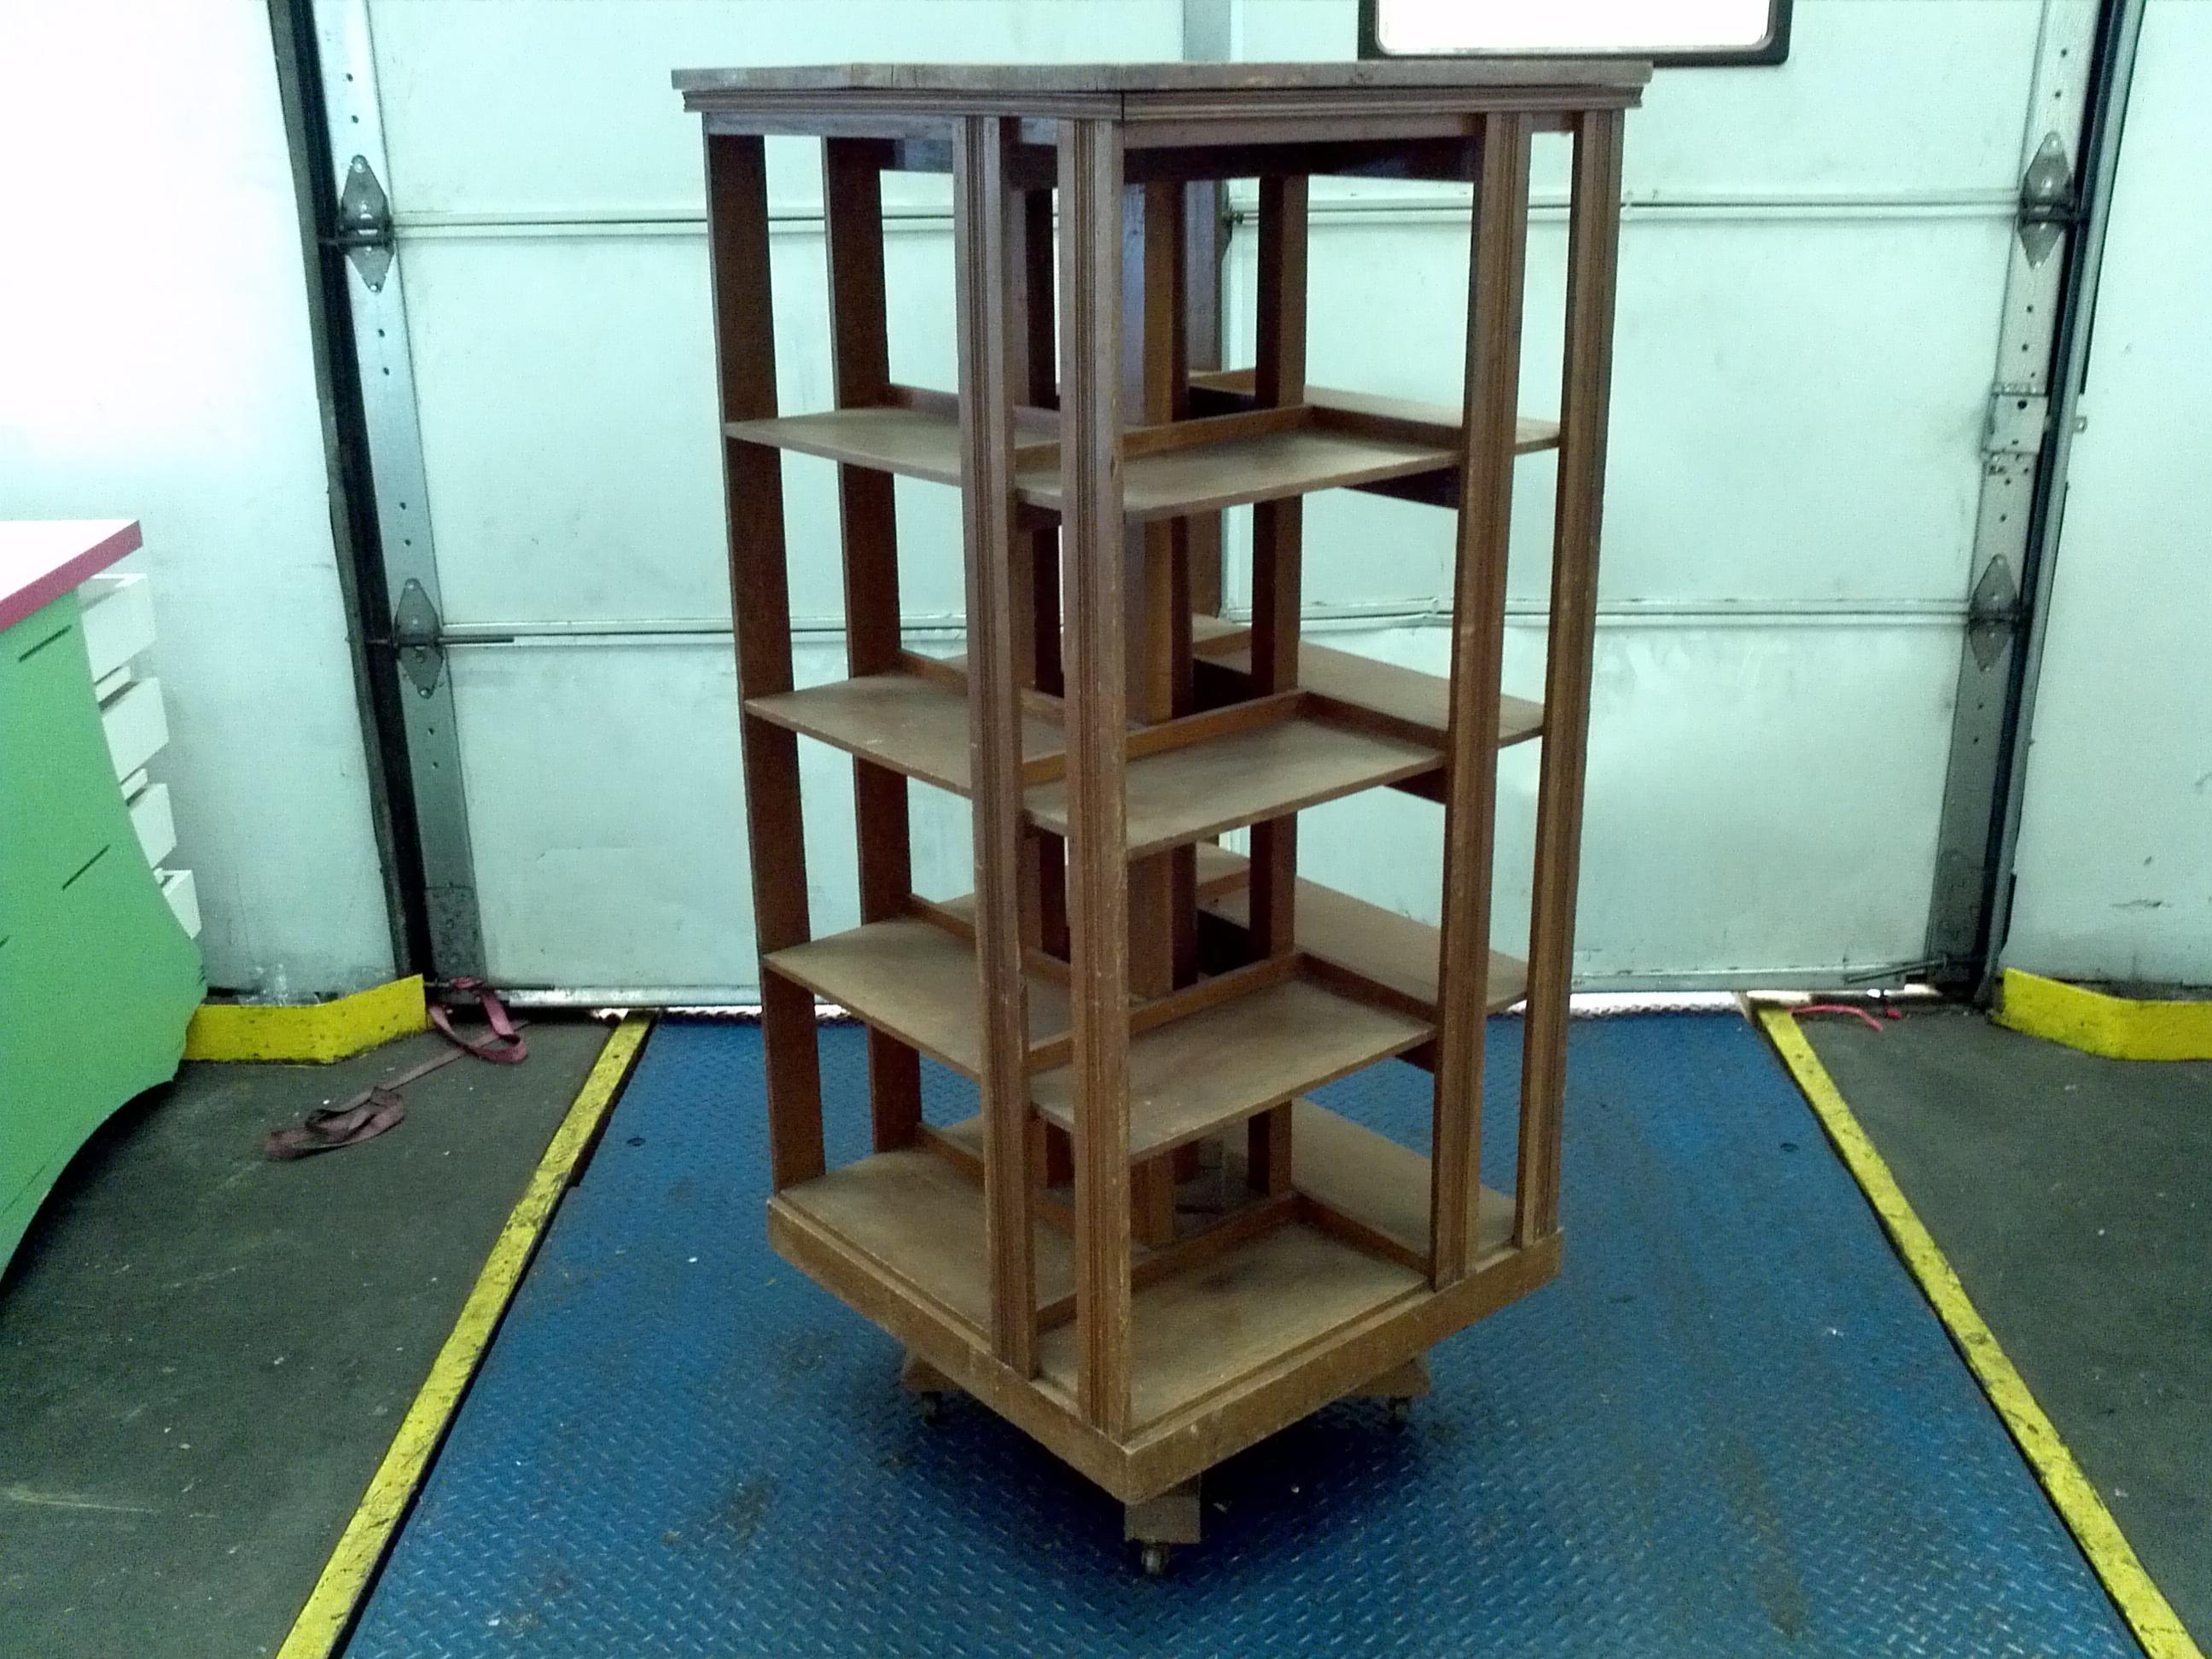 id pieces revolving georgian f storage case bookcases furniture bookcase at rotating master mahogany